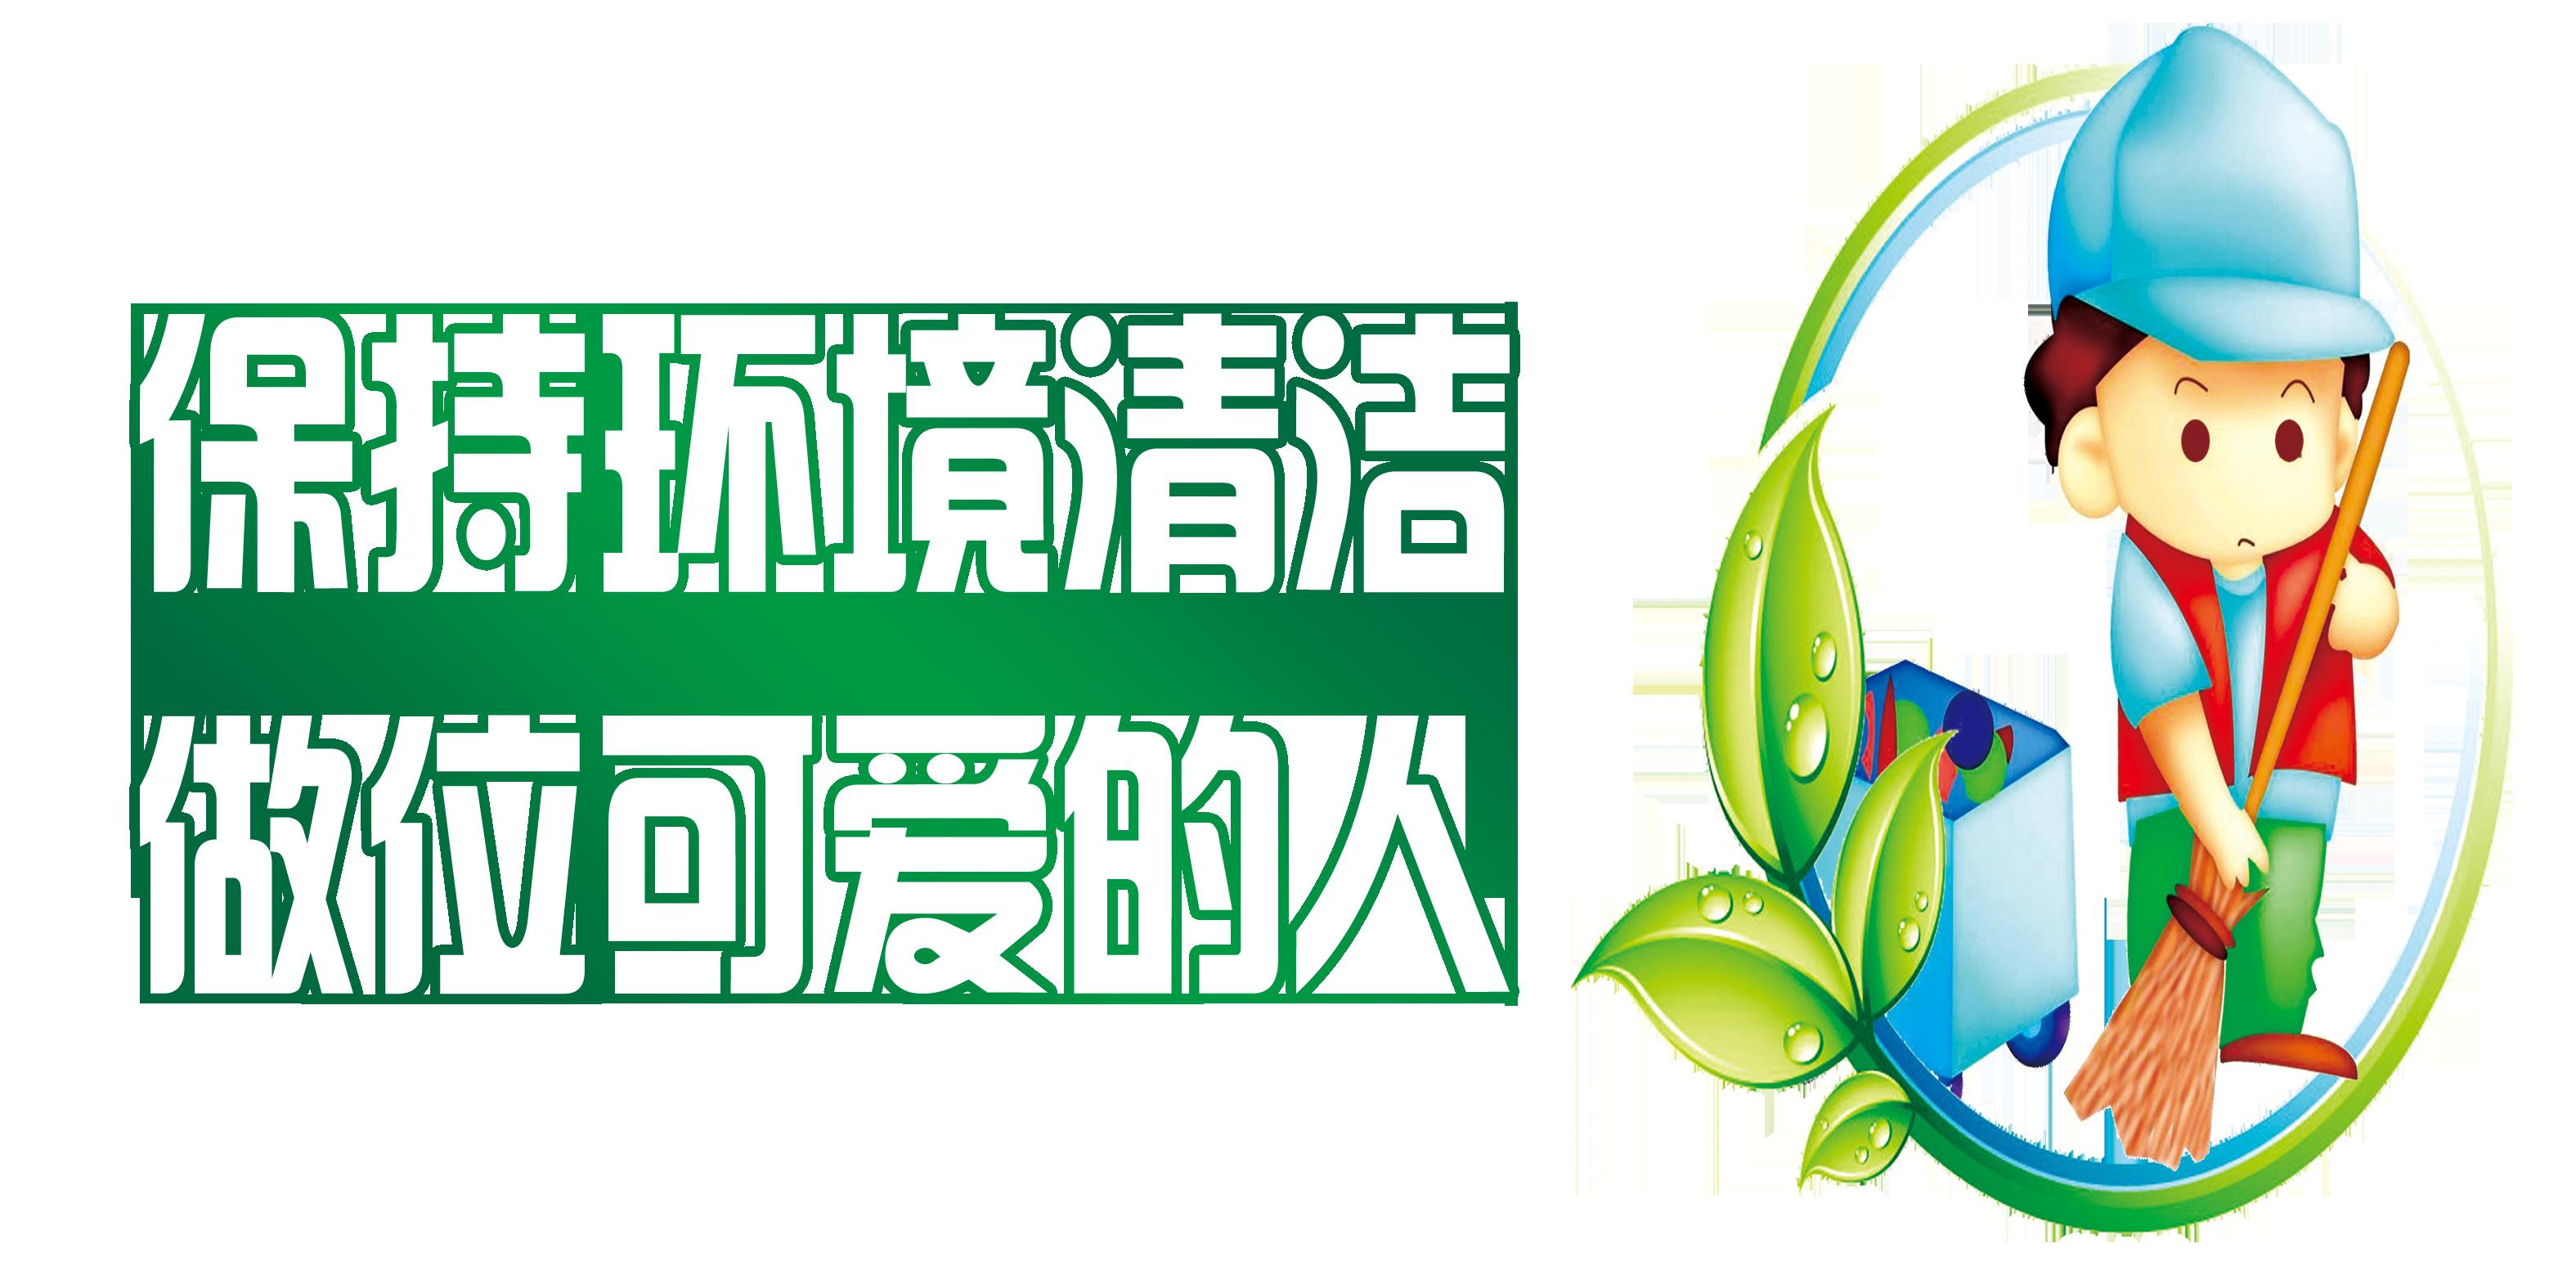 Slogan logo keep the. Environment clipart cleaning environment